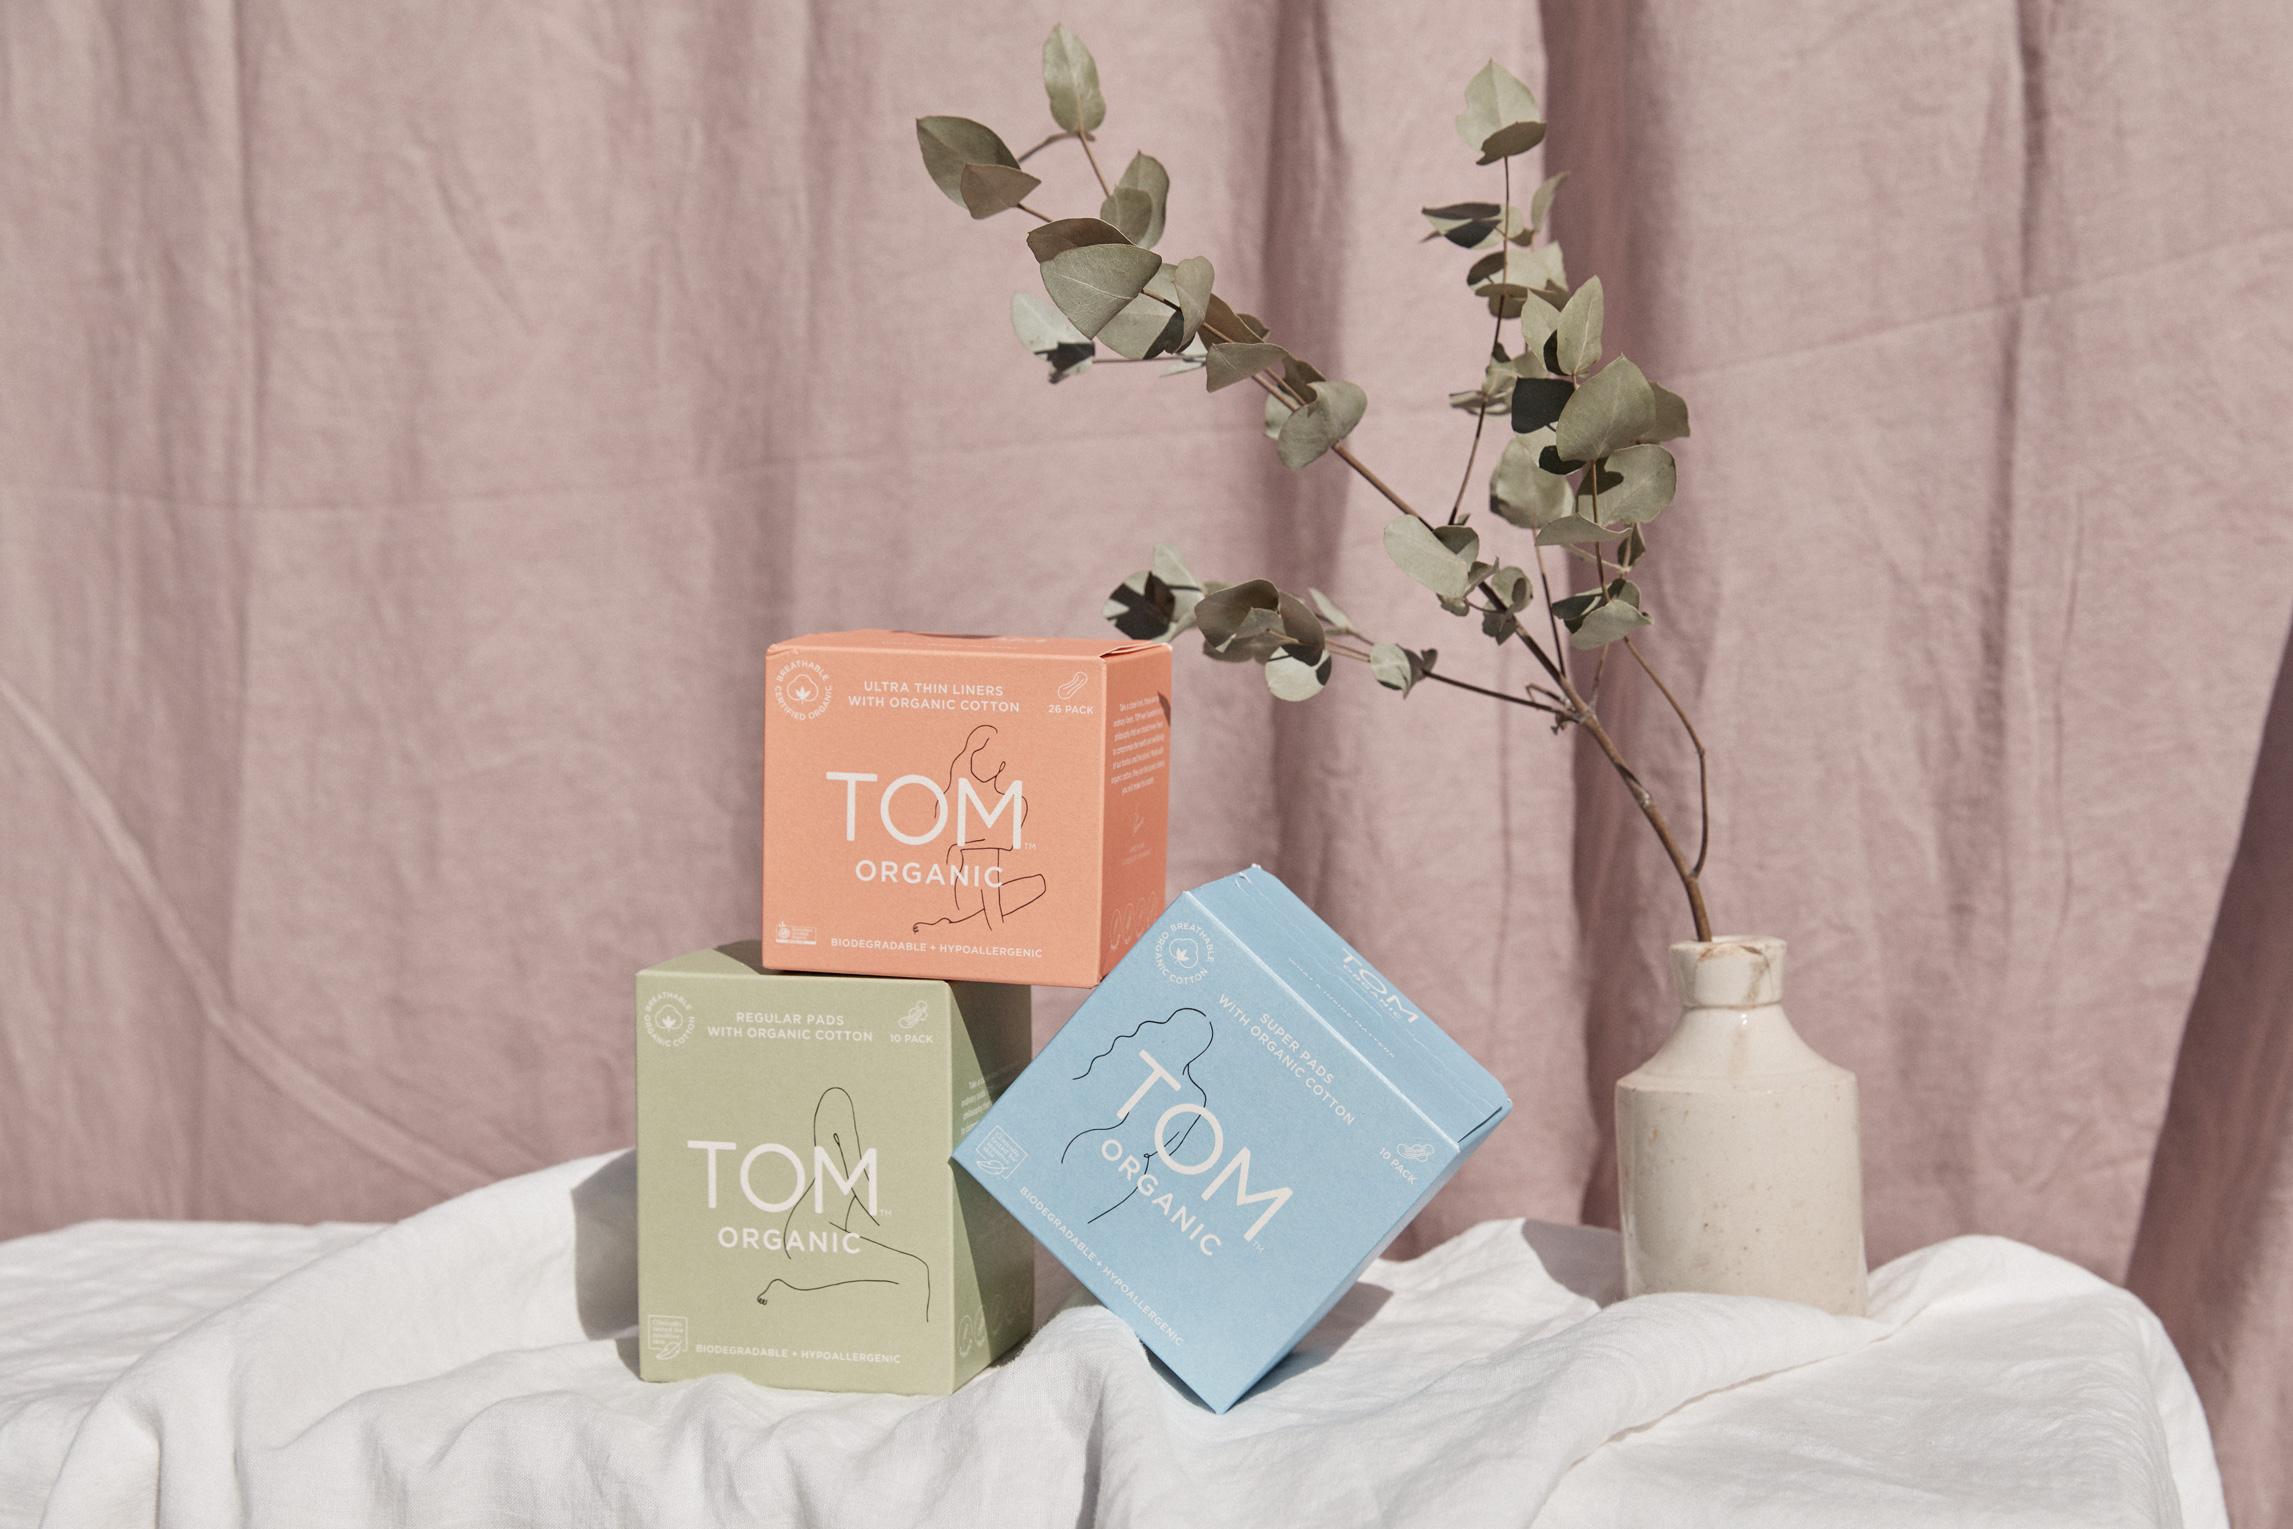 TOMS-Shot-9-046.jpg